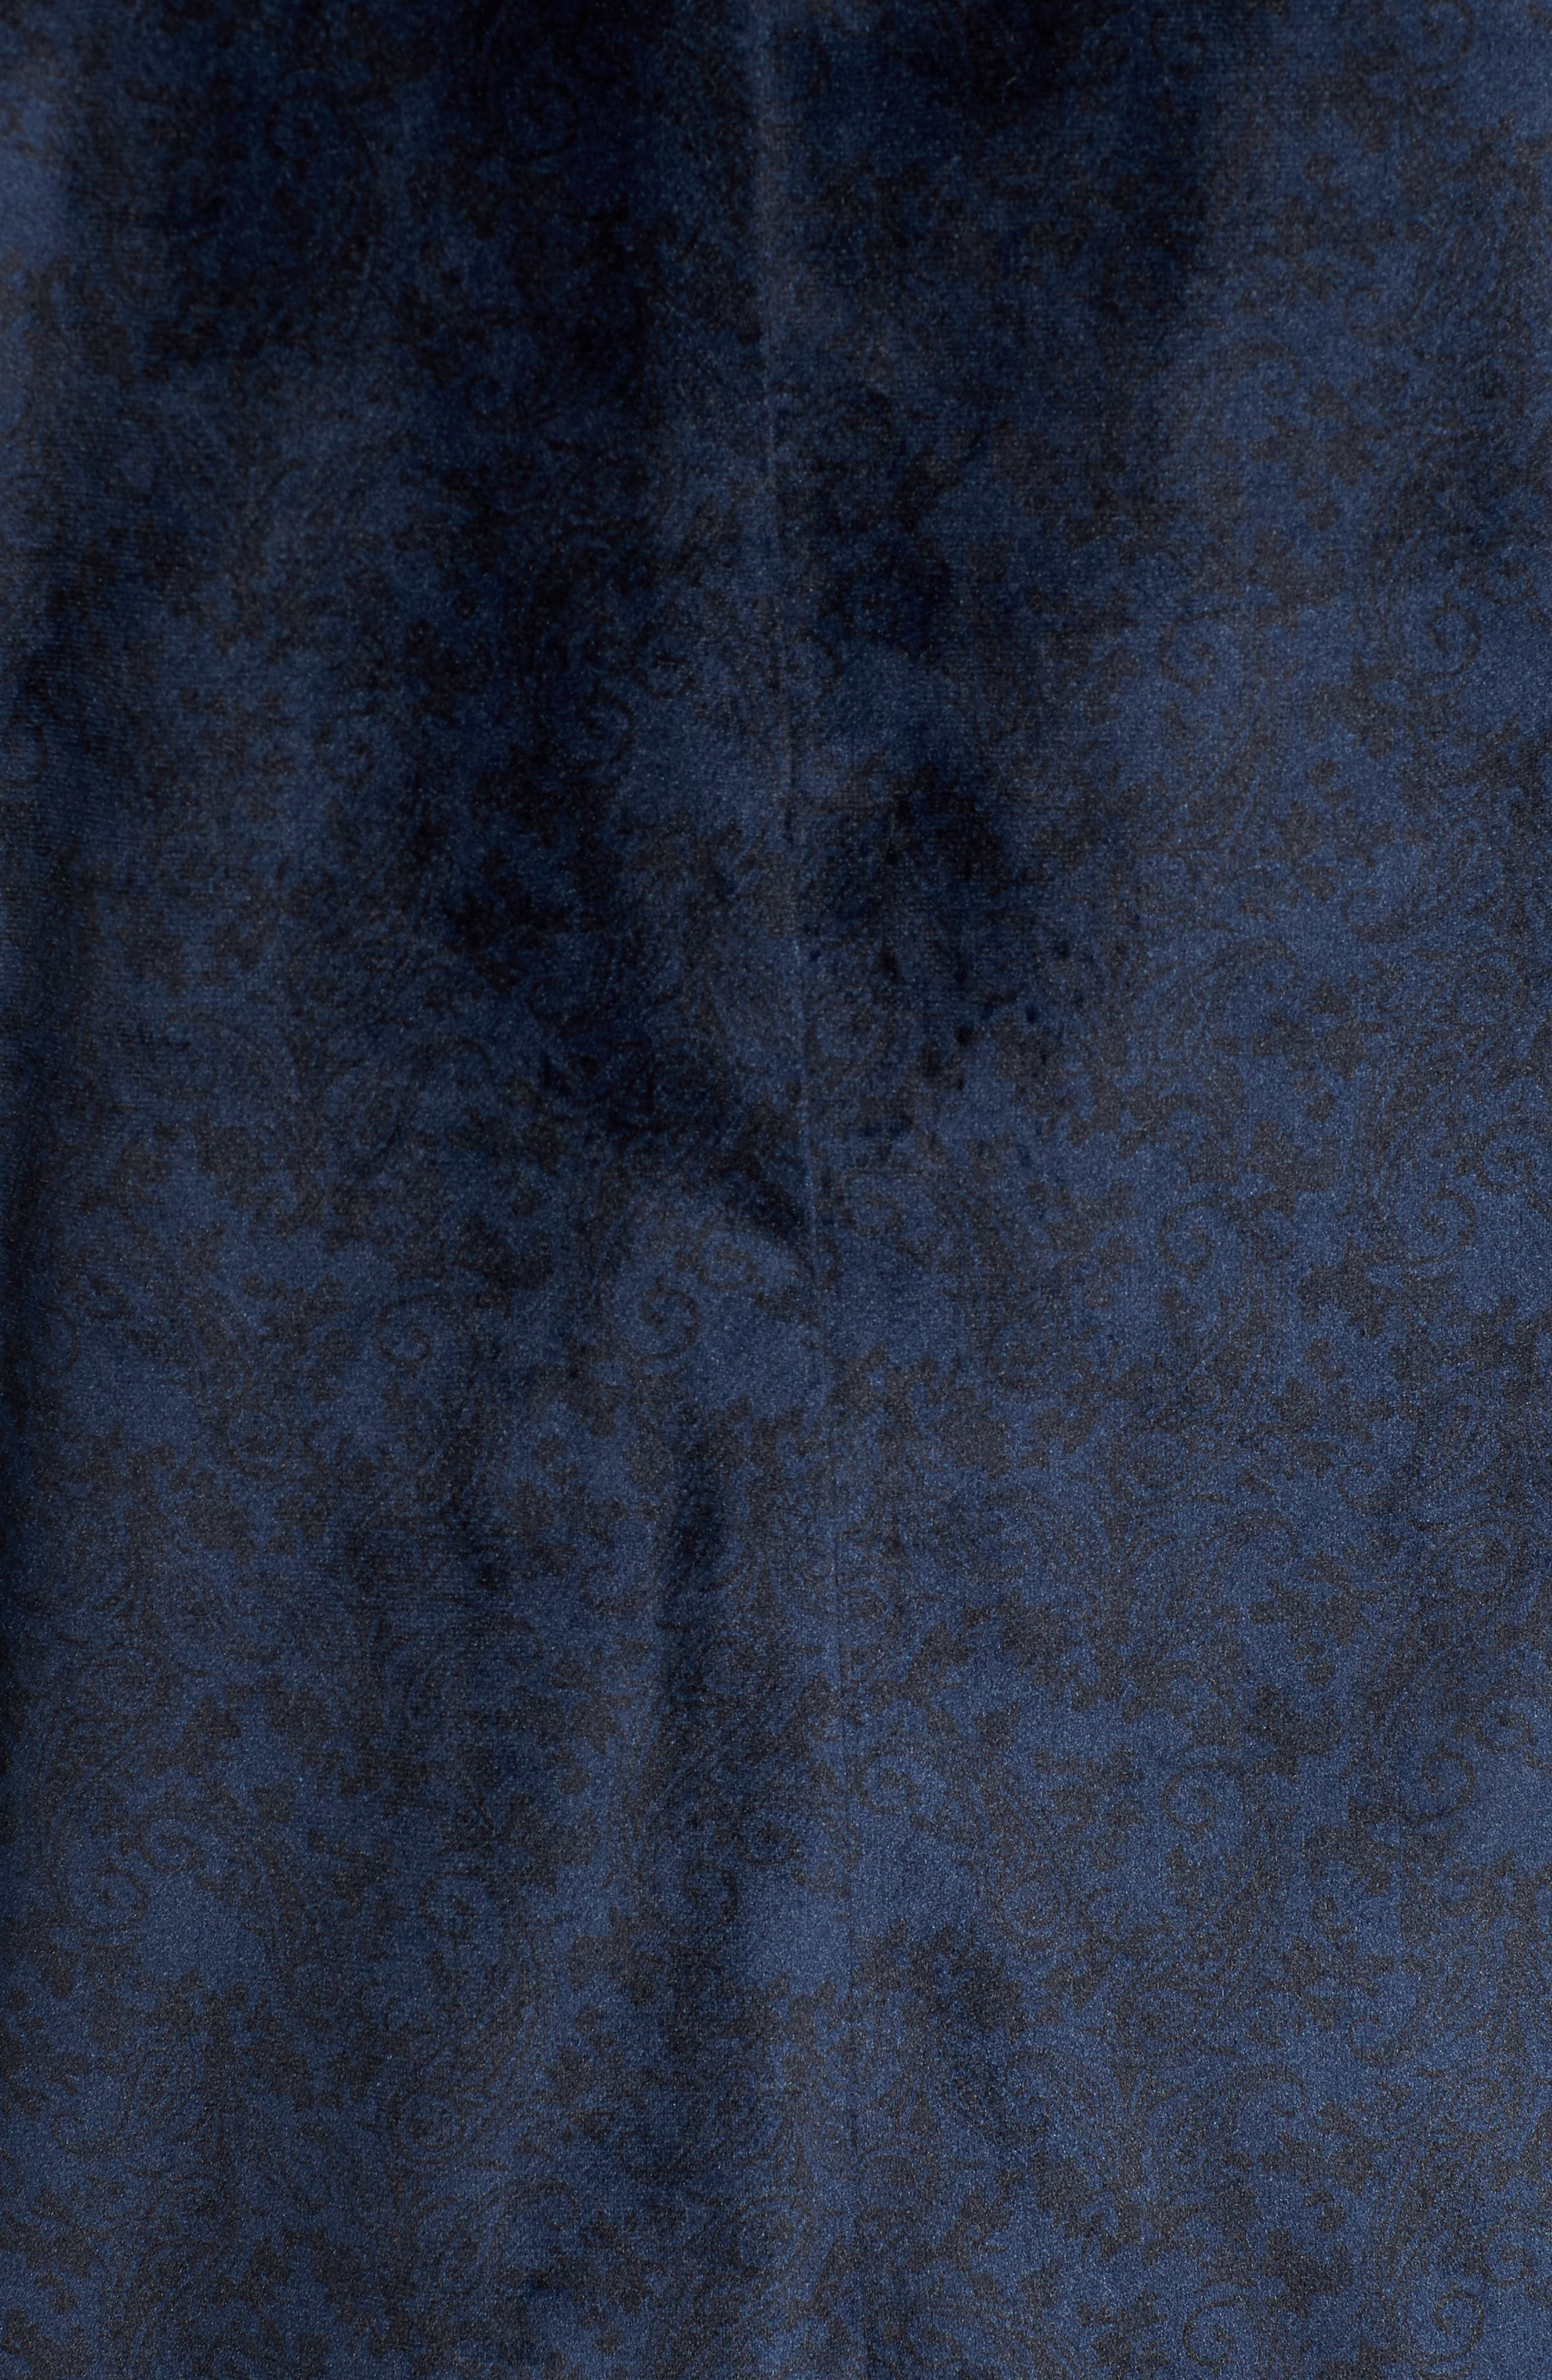 Barton Tailored Fit Blazer,                             Alternate thumbnail 6, color,                             NAVY